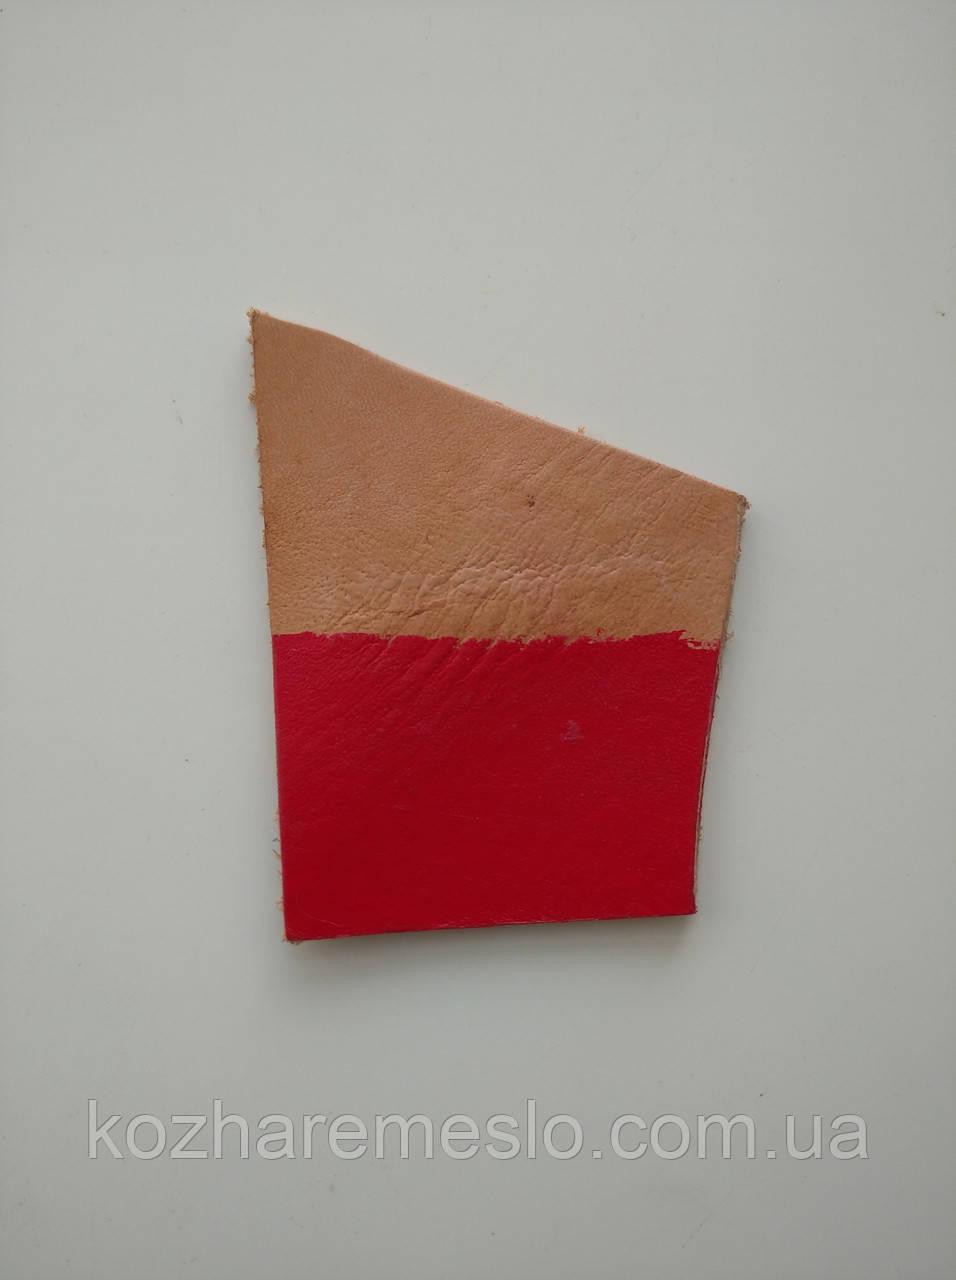 Краска для кожи HP COLOURS Fenice на водной основе пигментная 30 мл красная (Италия)